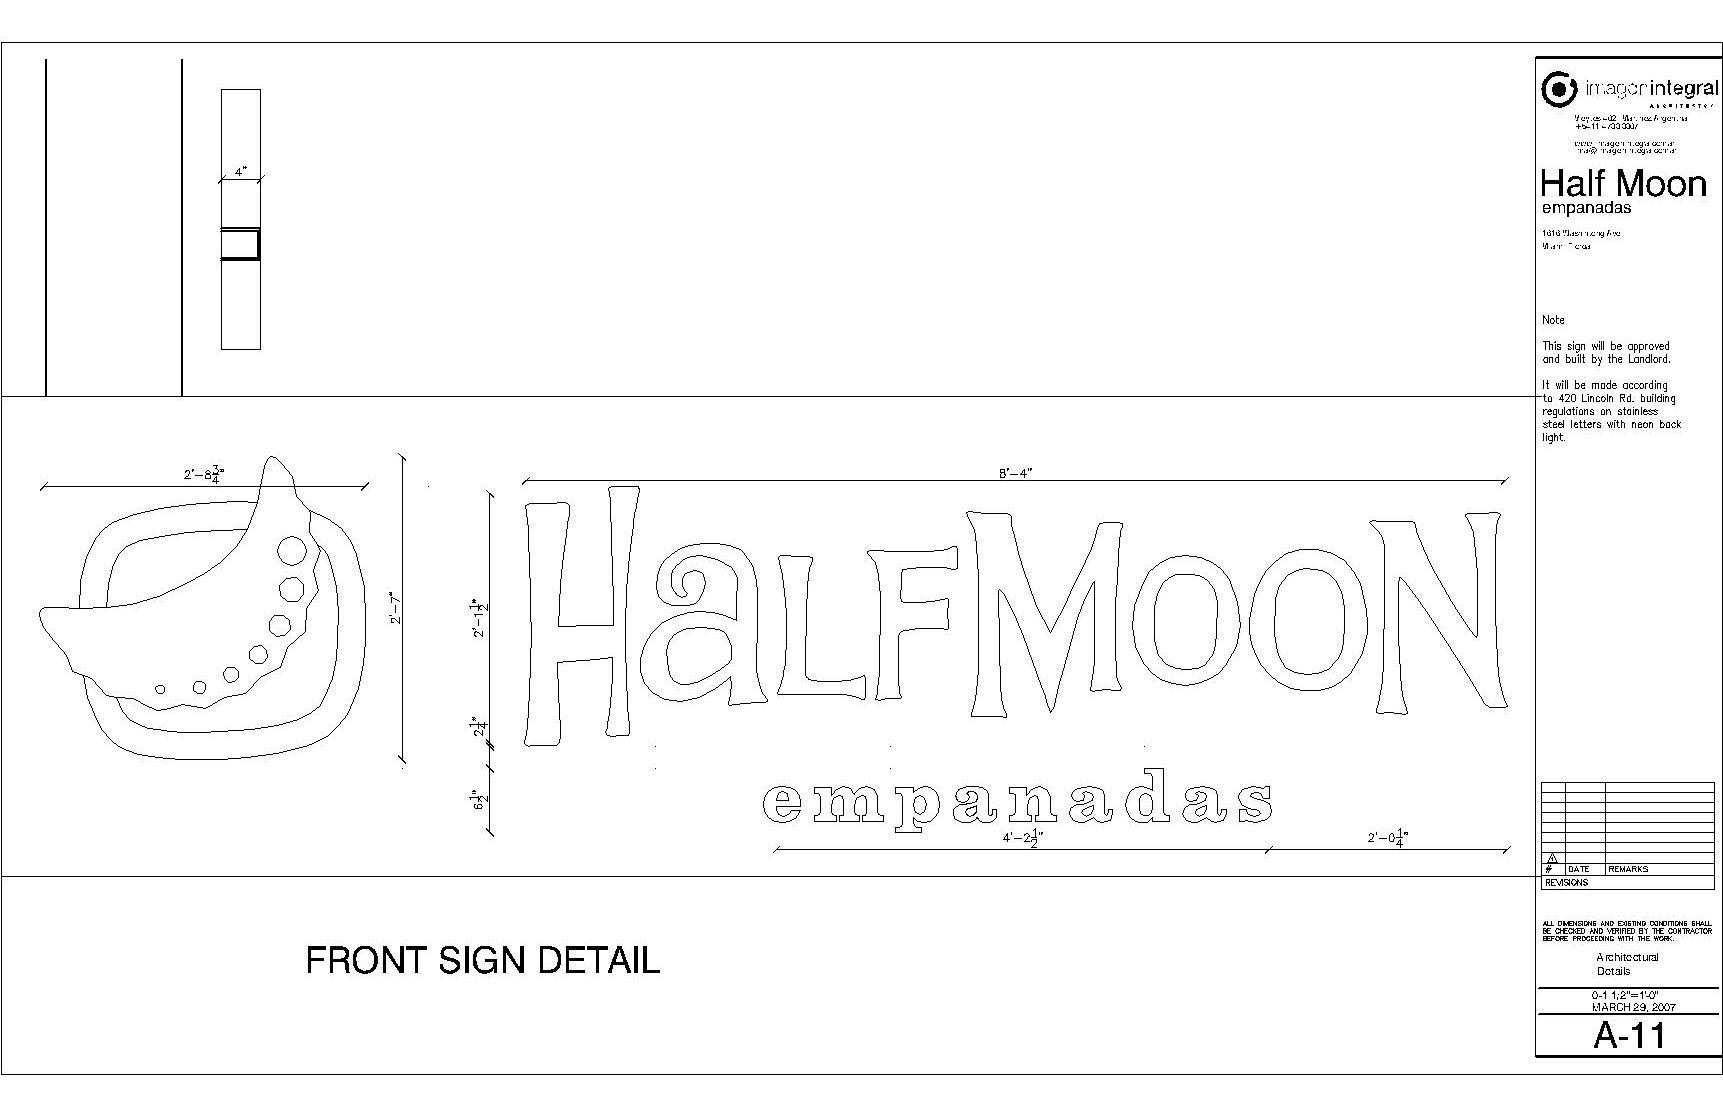 Halfmoon_12